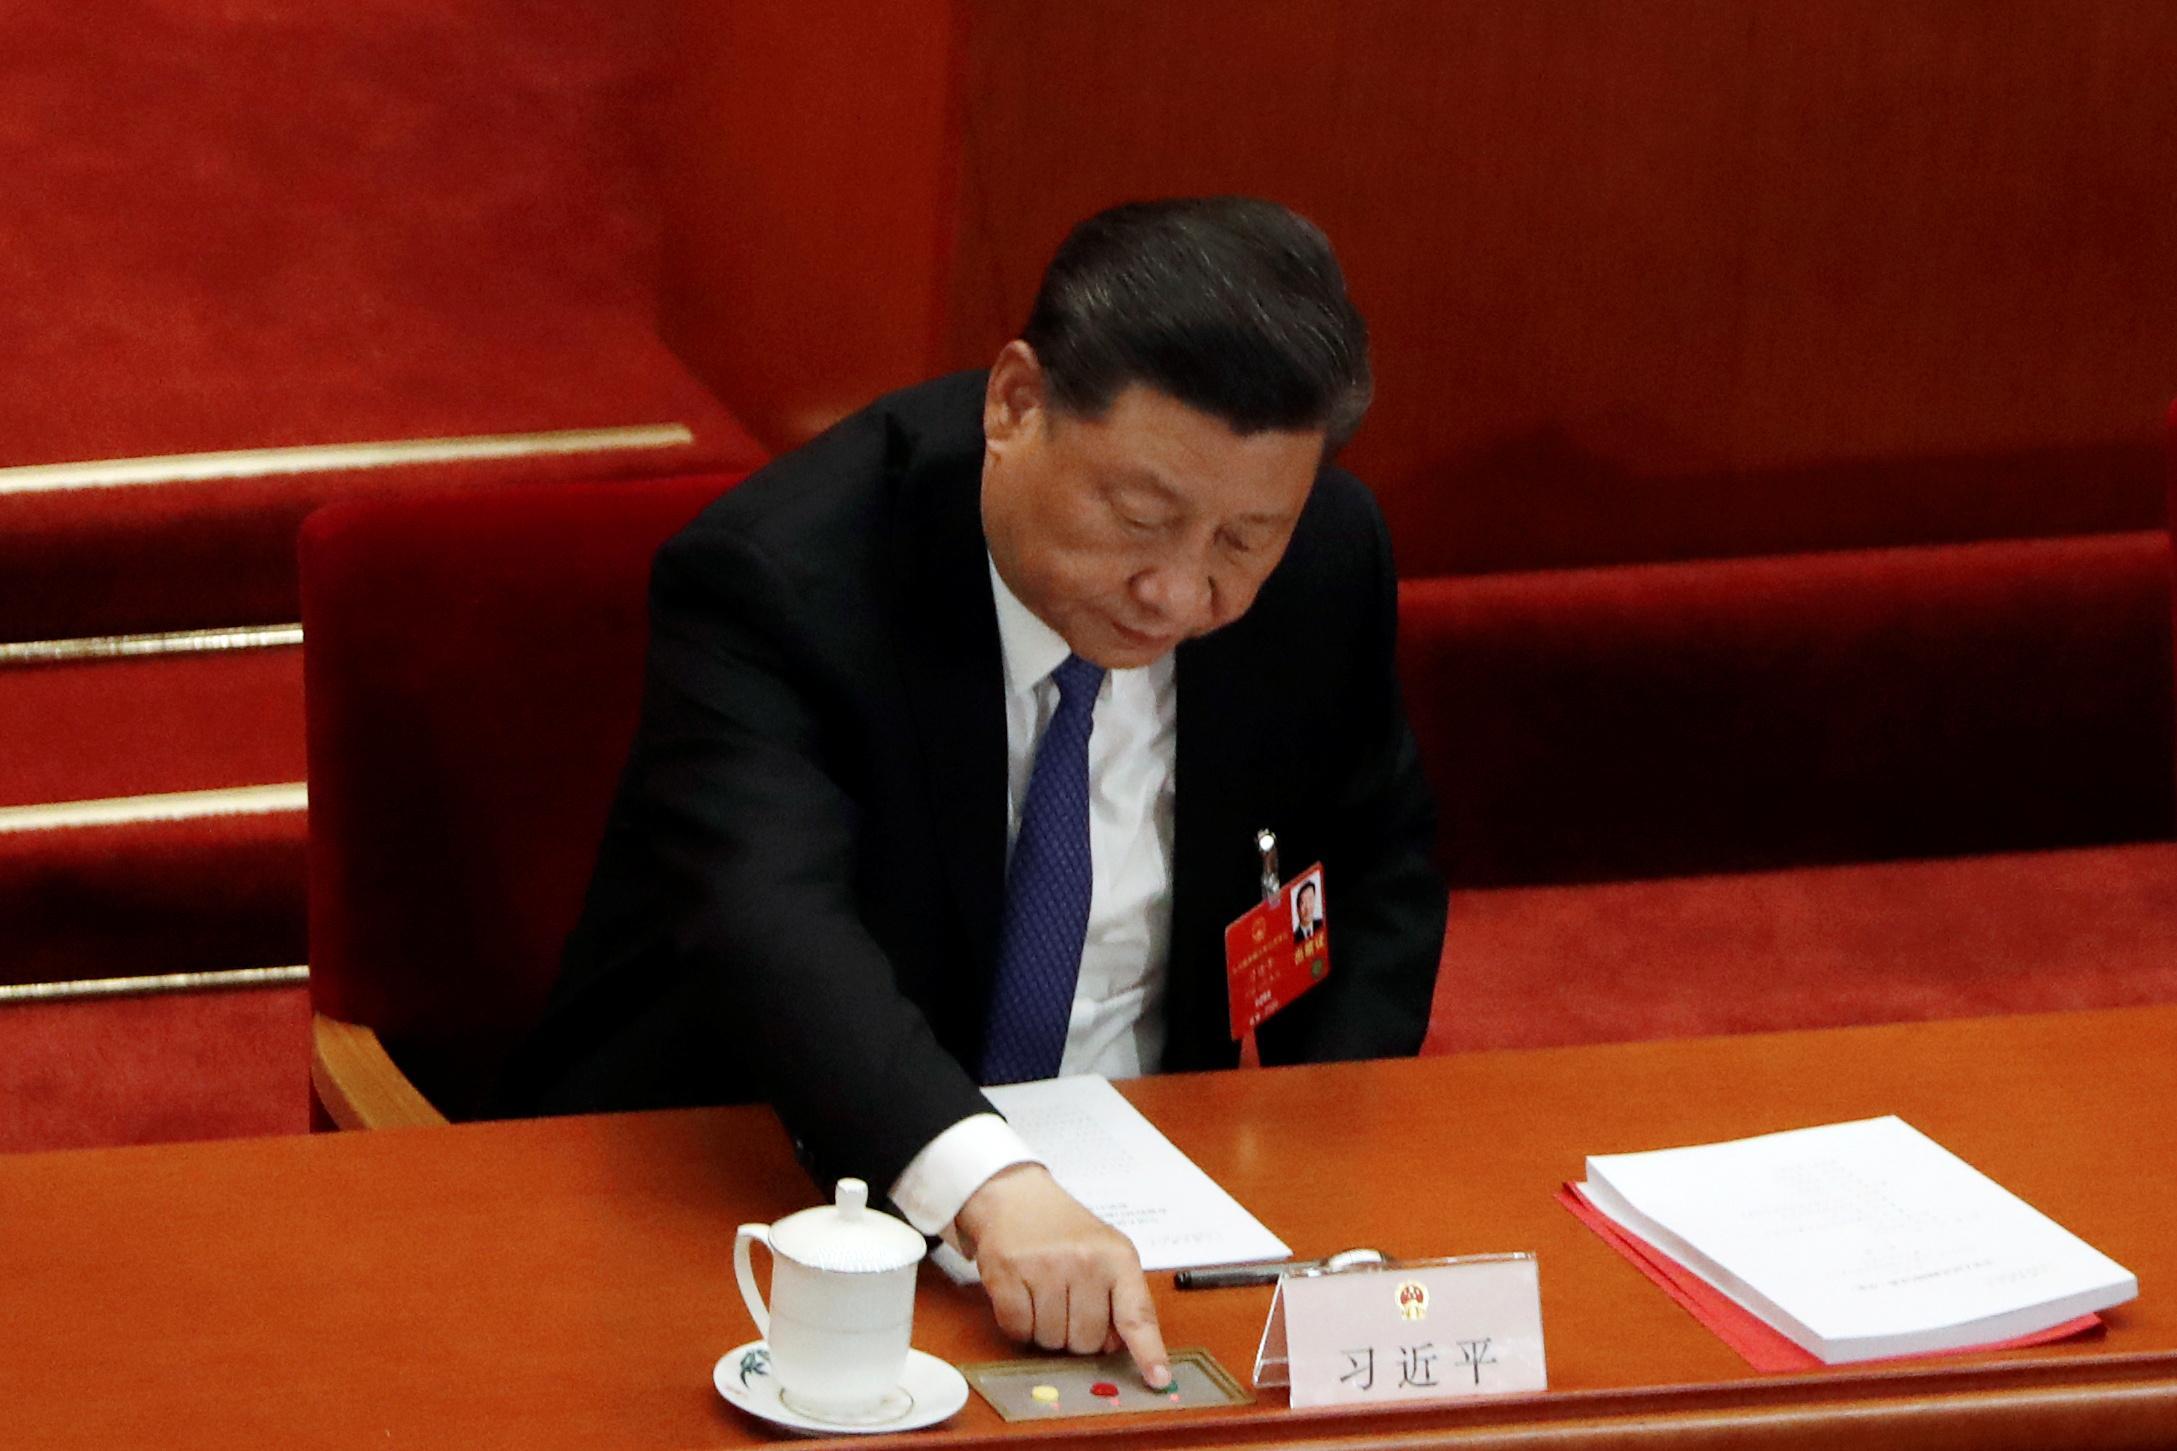 China parliament advances Hong Kong security law as U.S. tensions rise